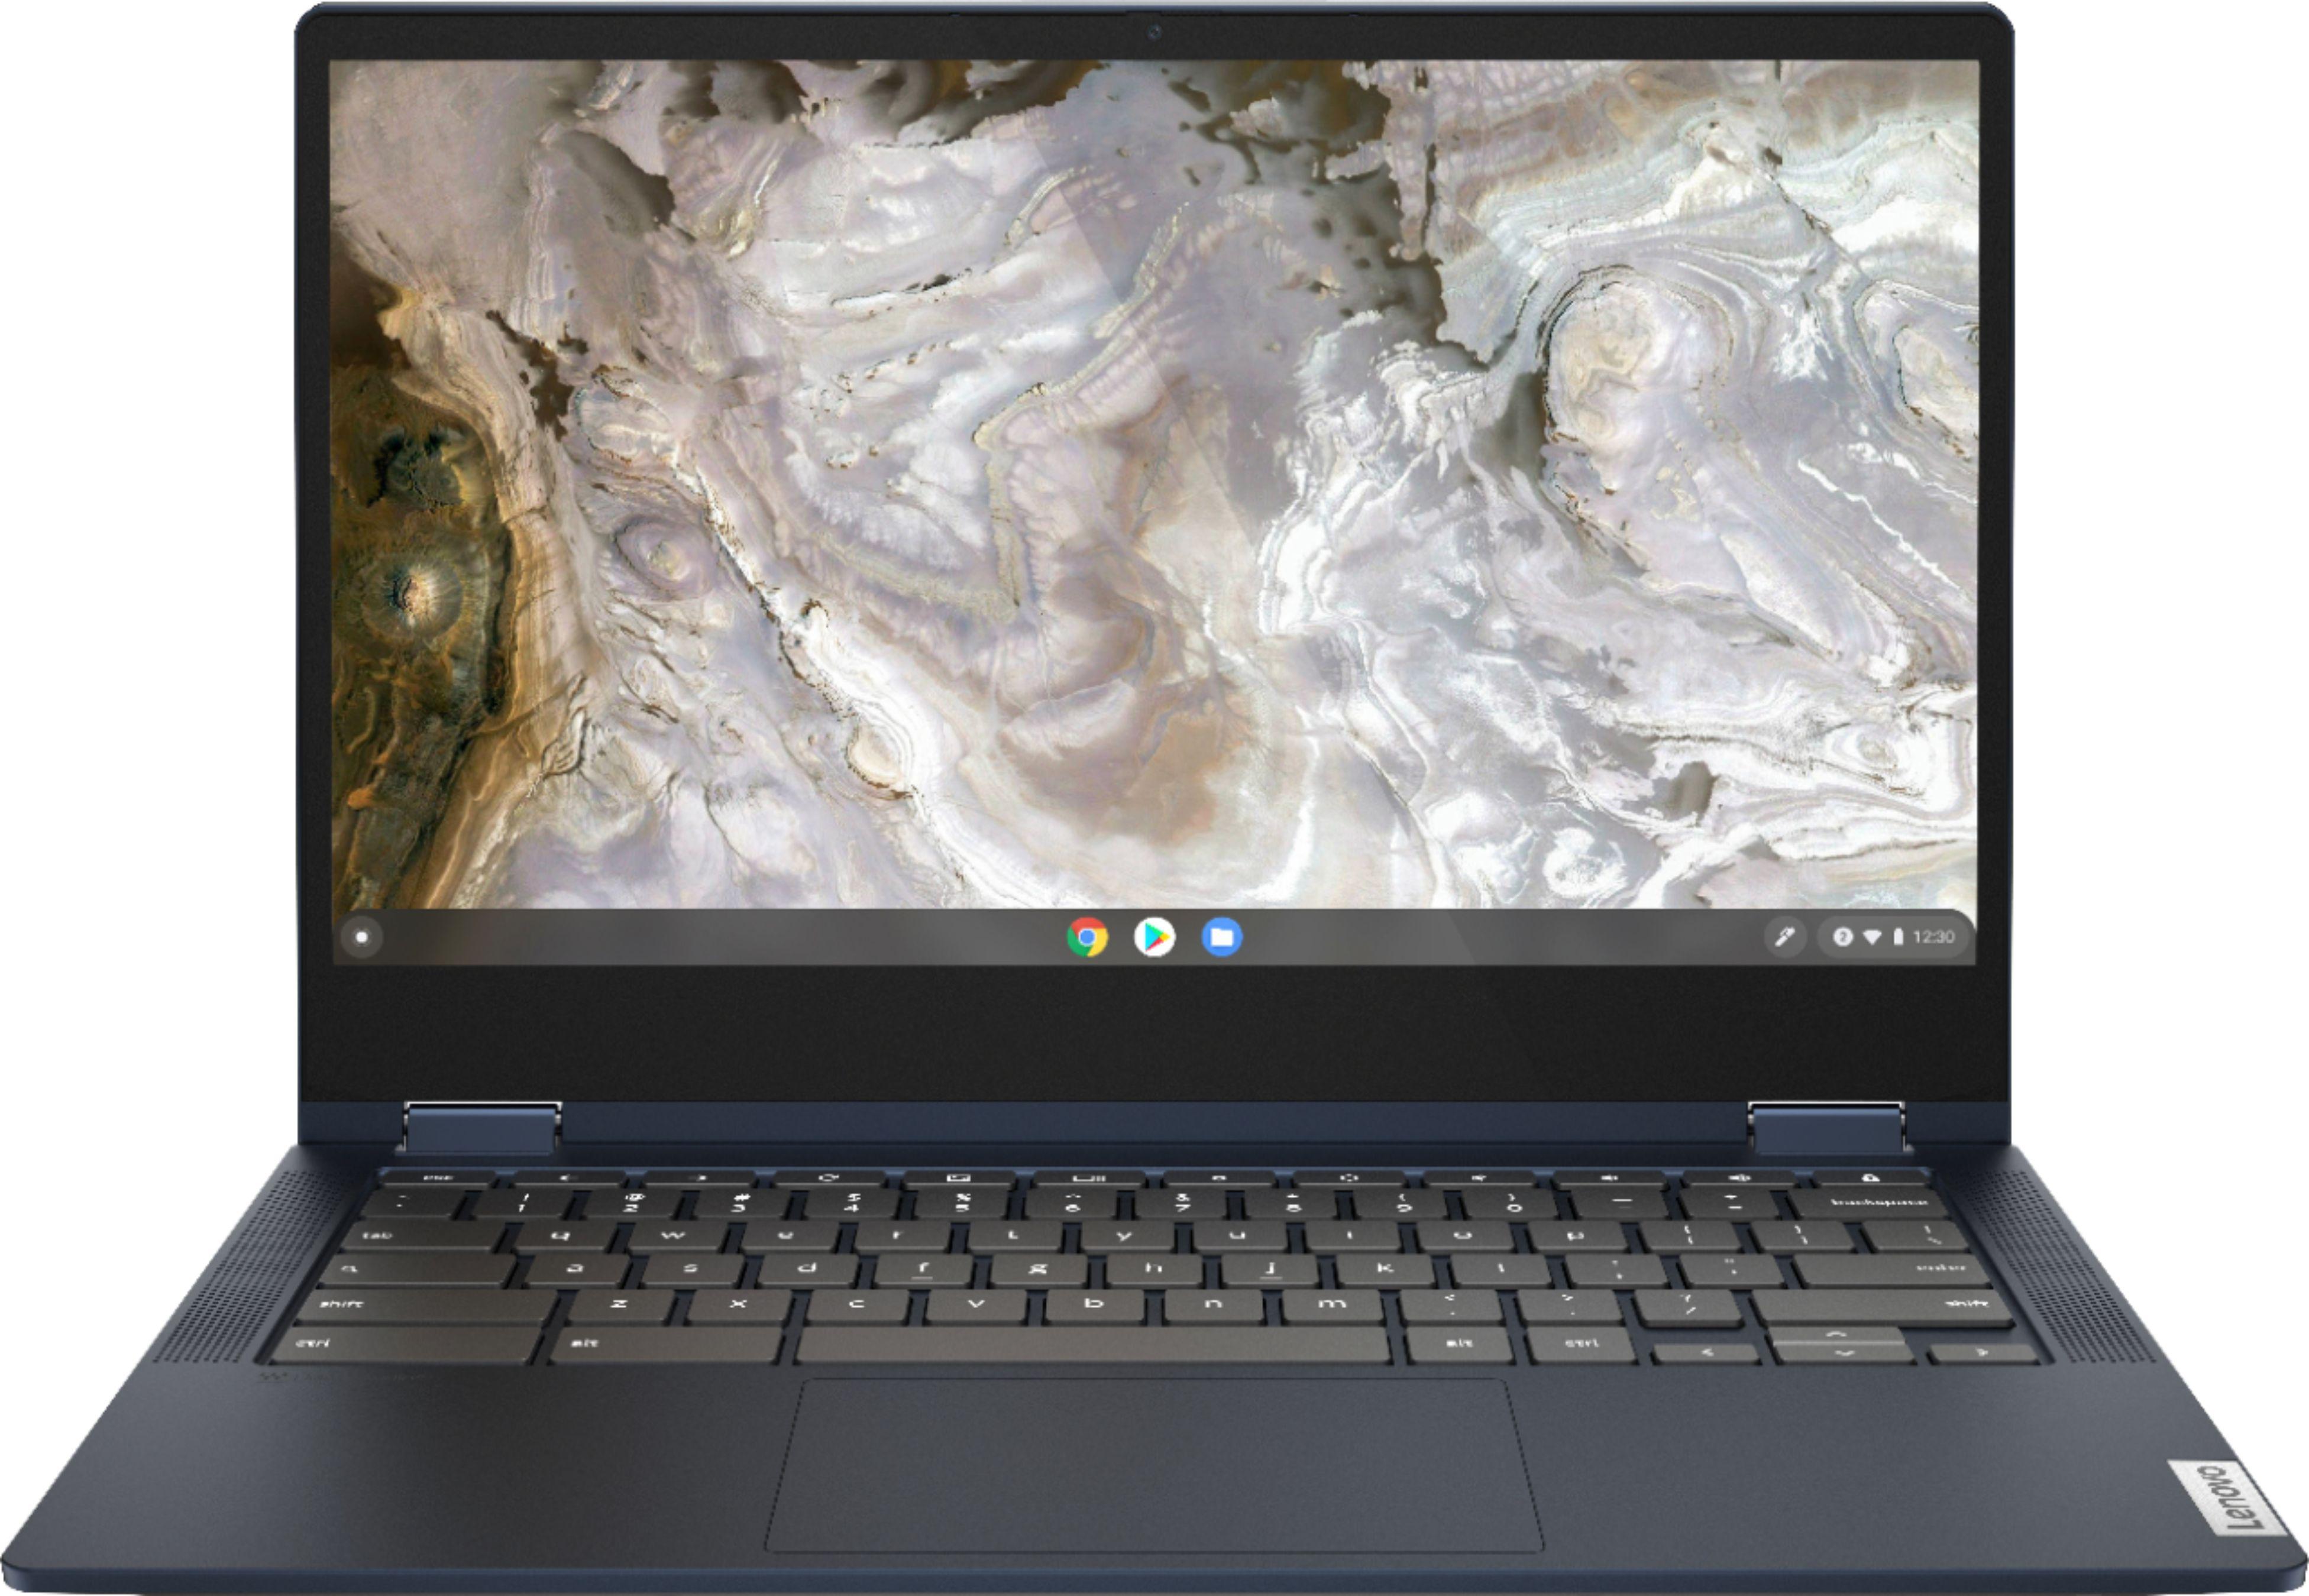 "Lenovo Flex 5 ChromeBook 2-in-1: 13.3"" FHD IPS Touch, Pentium Gold 7505, 4GB LPDDR4X, 32GB eMMC @ $299.99 + F/S at Best Buy"